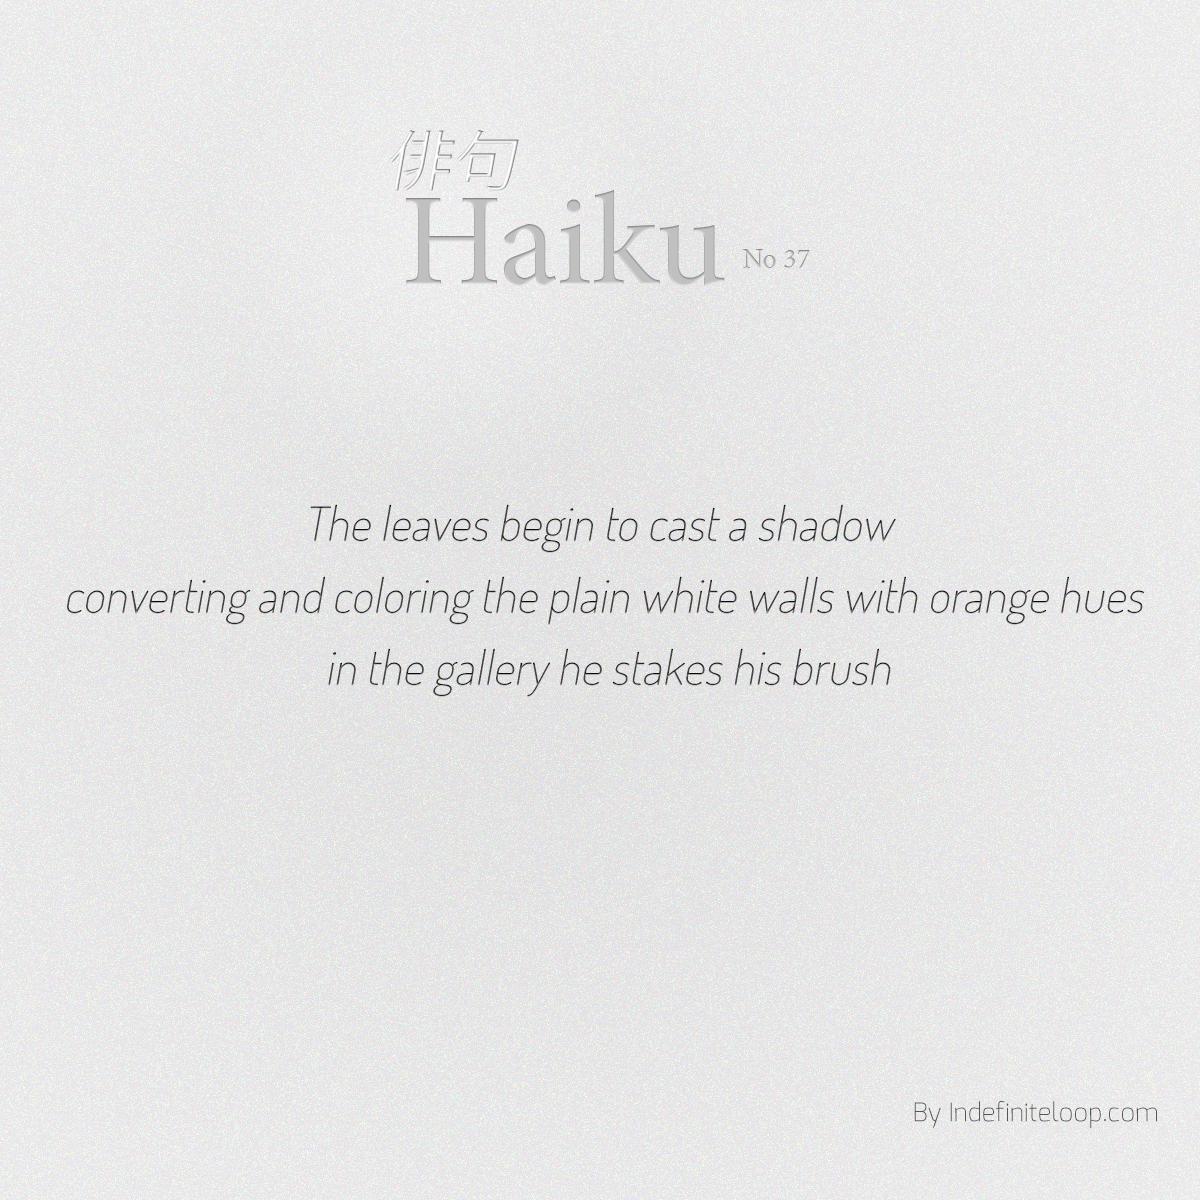 indefiniteloop.com - Haiku No. 37- Risk Your Art.